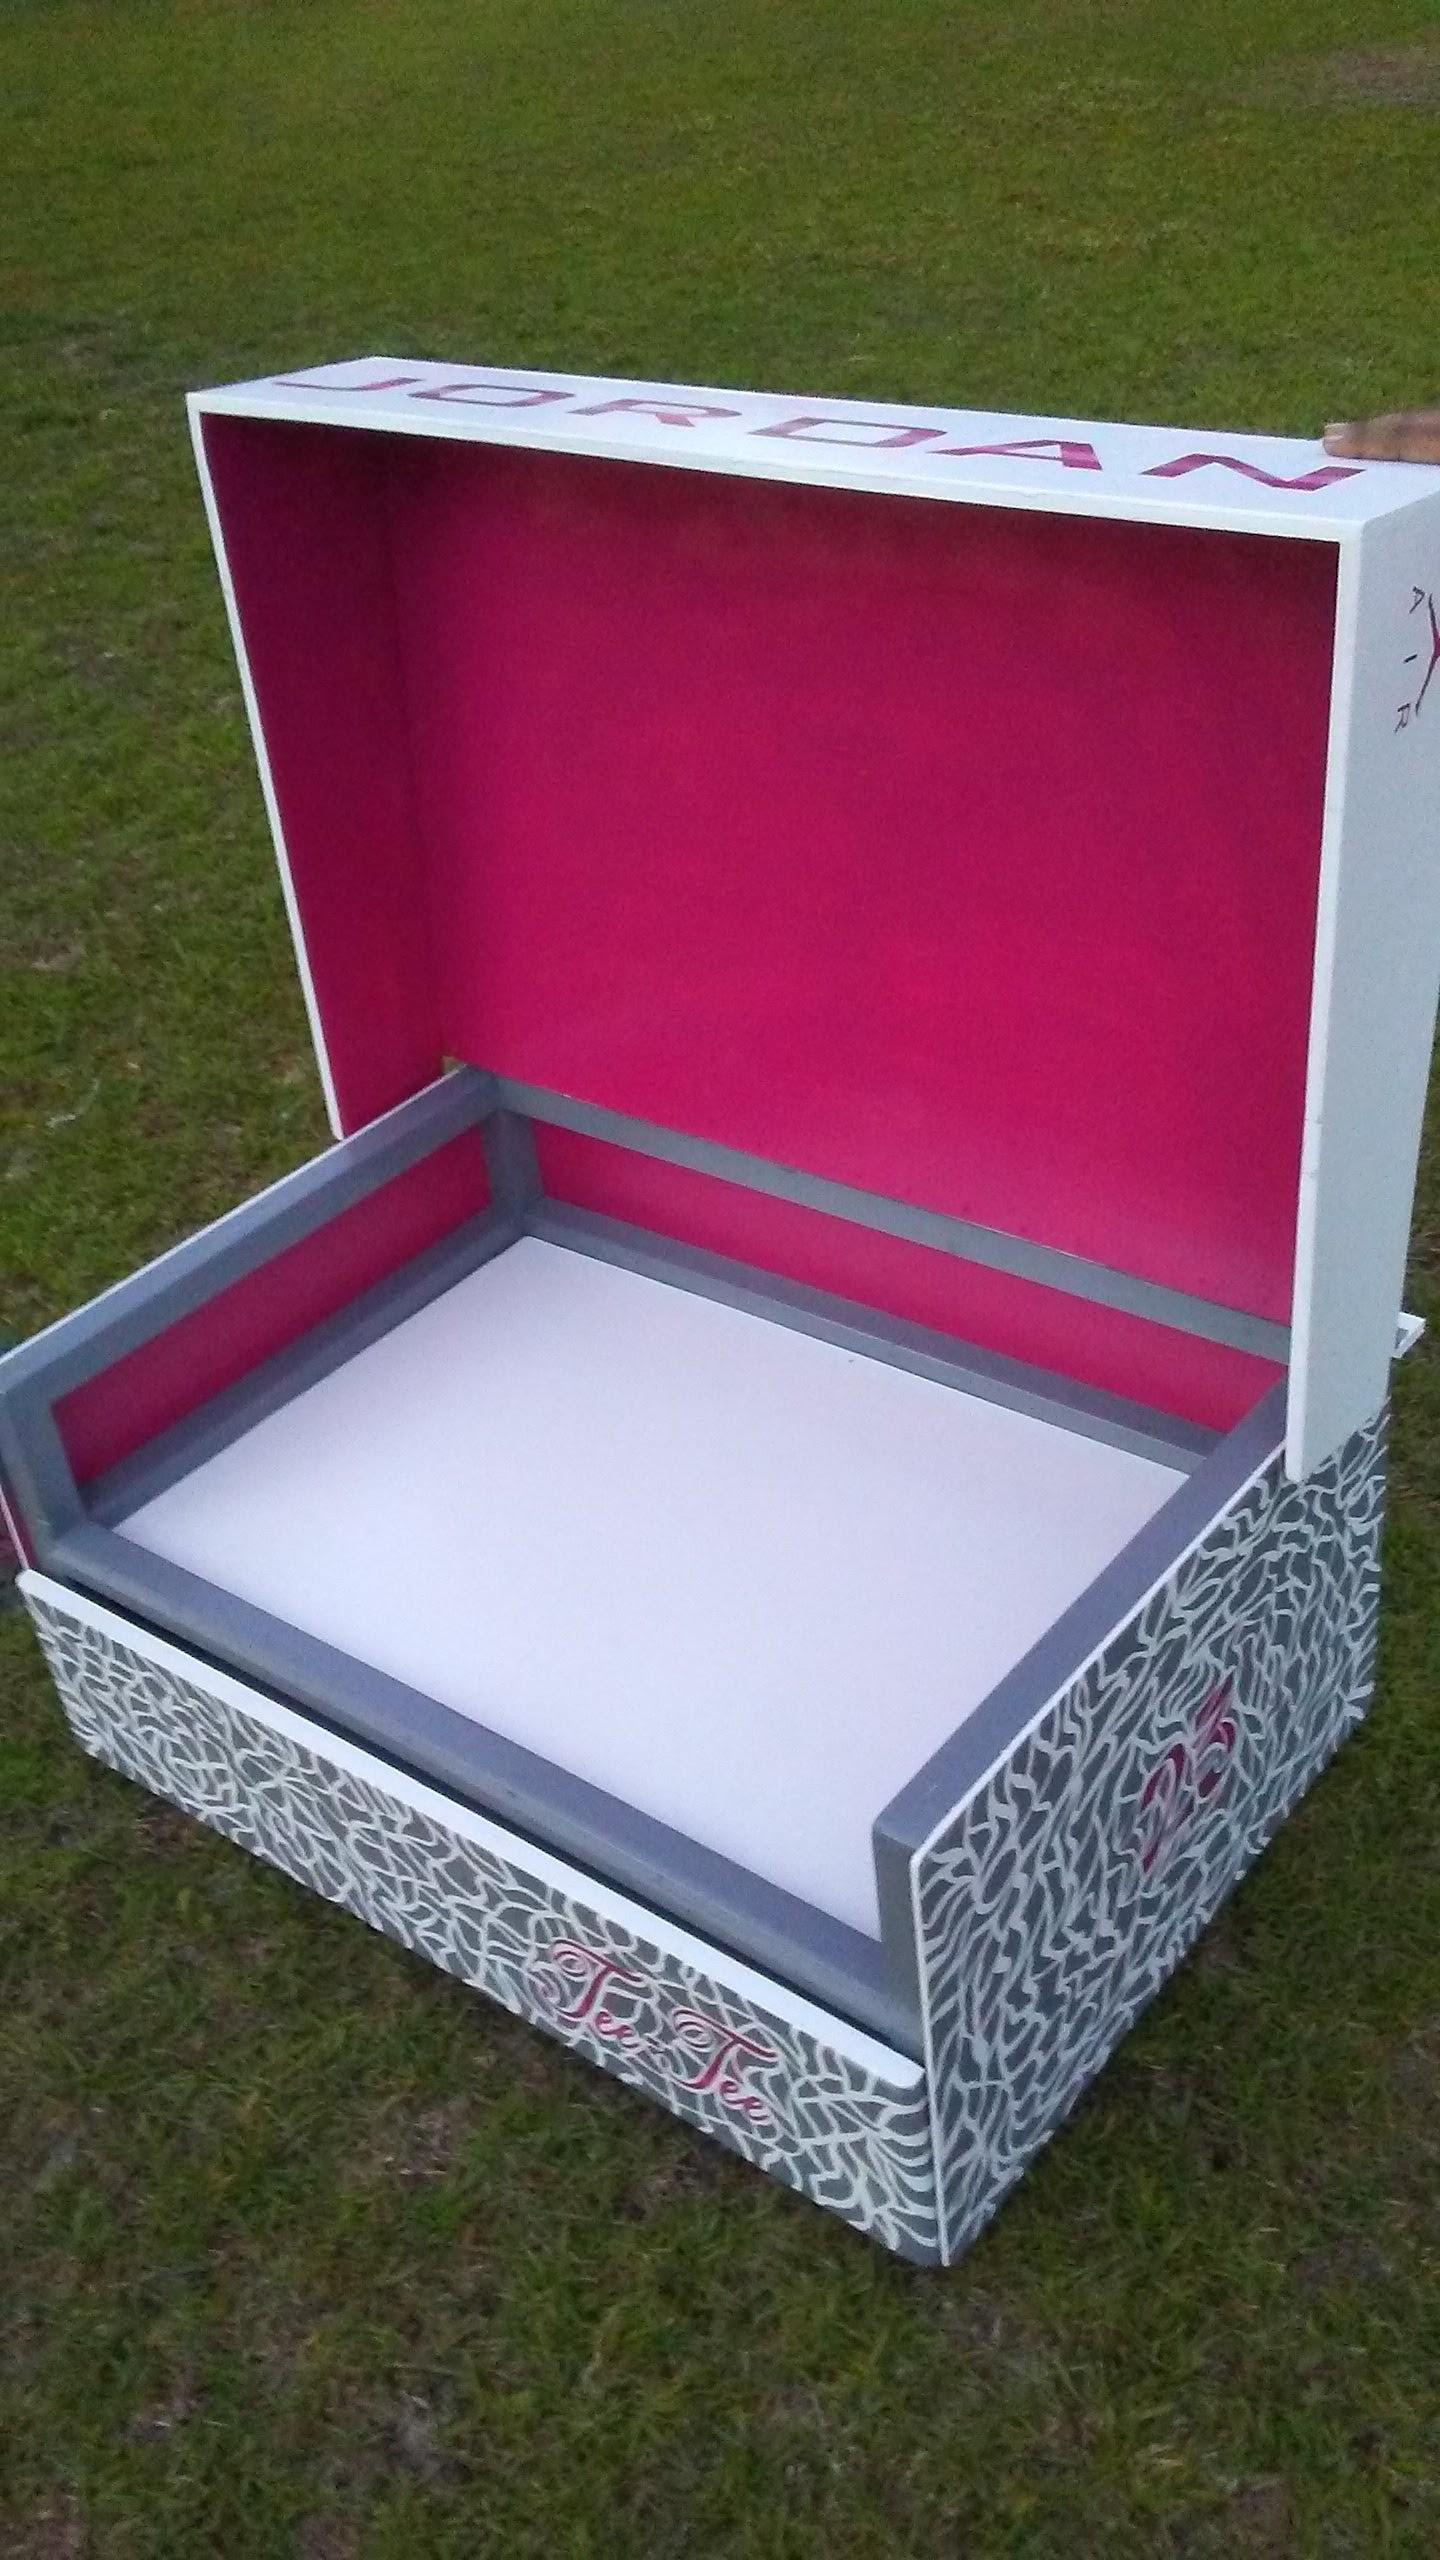 Pink and Gray Jordan Shoe Box — King Sr. Woodworking